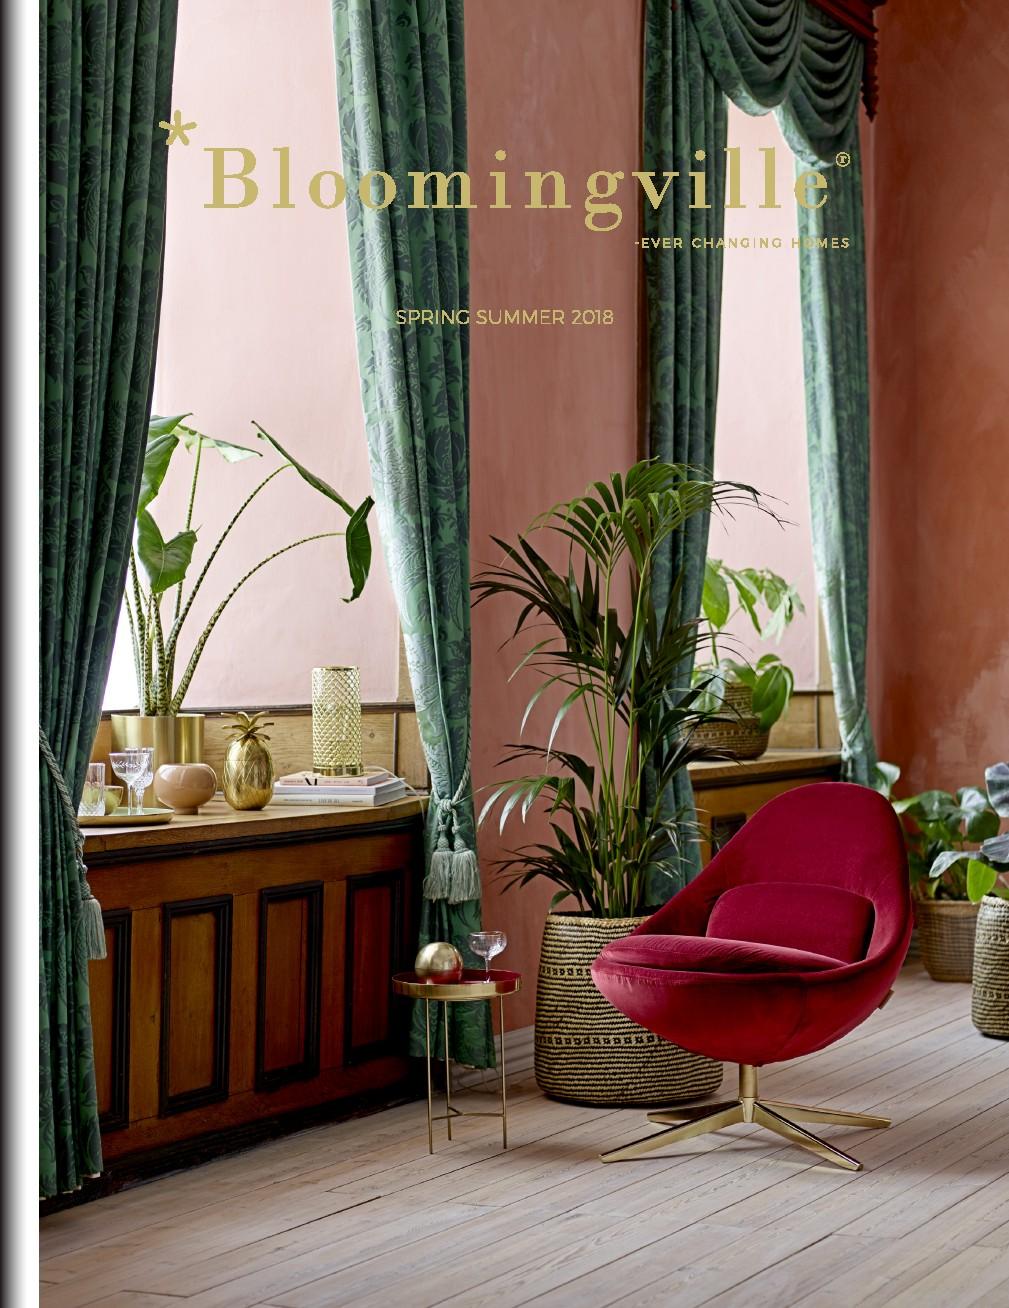 okładka - katalog blomingville wiosna lato 2018